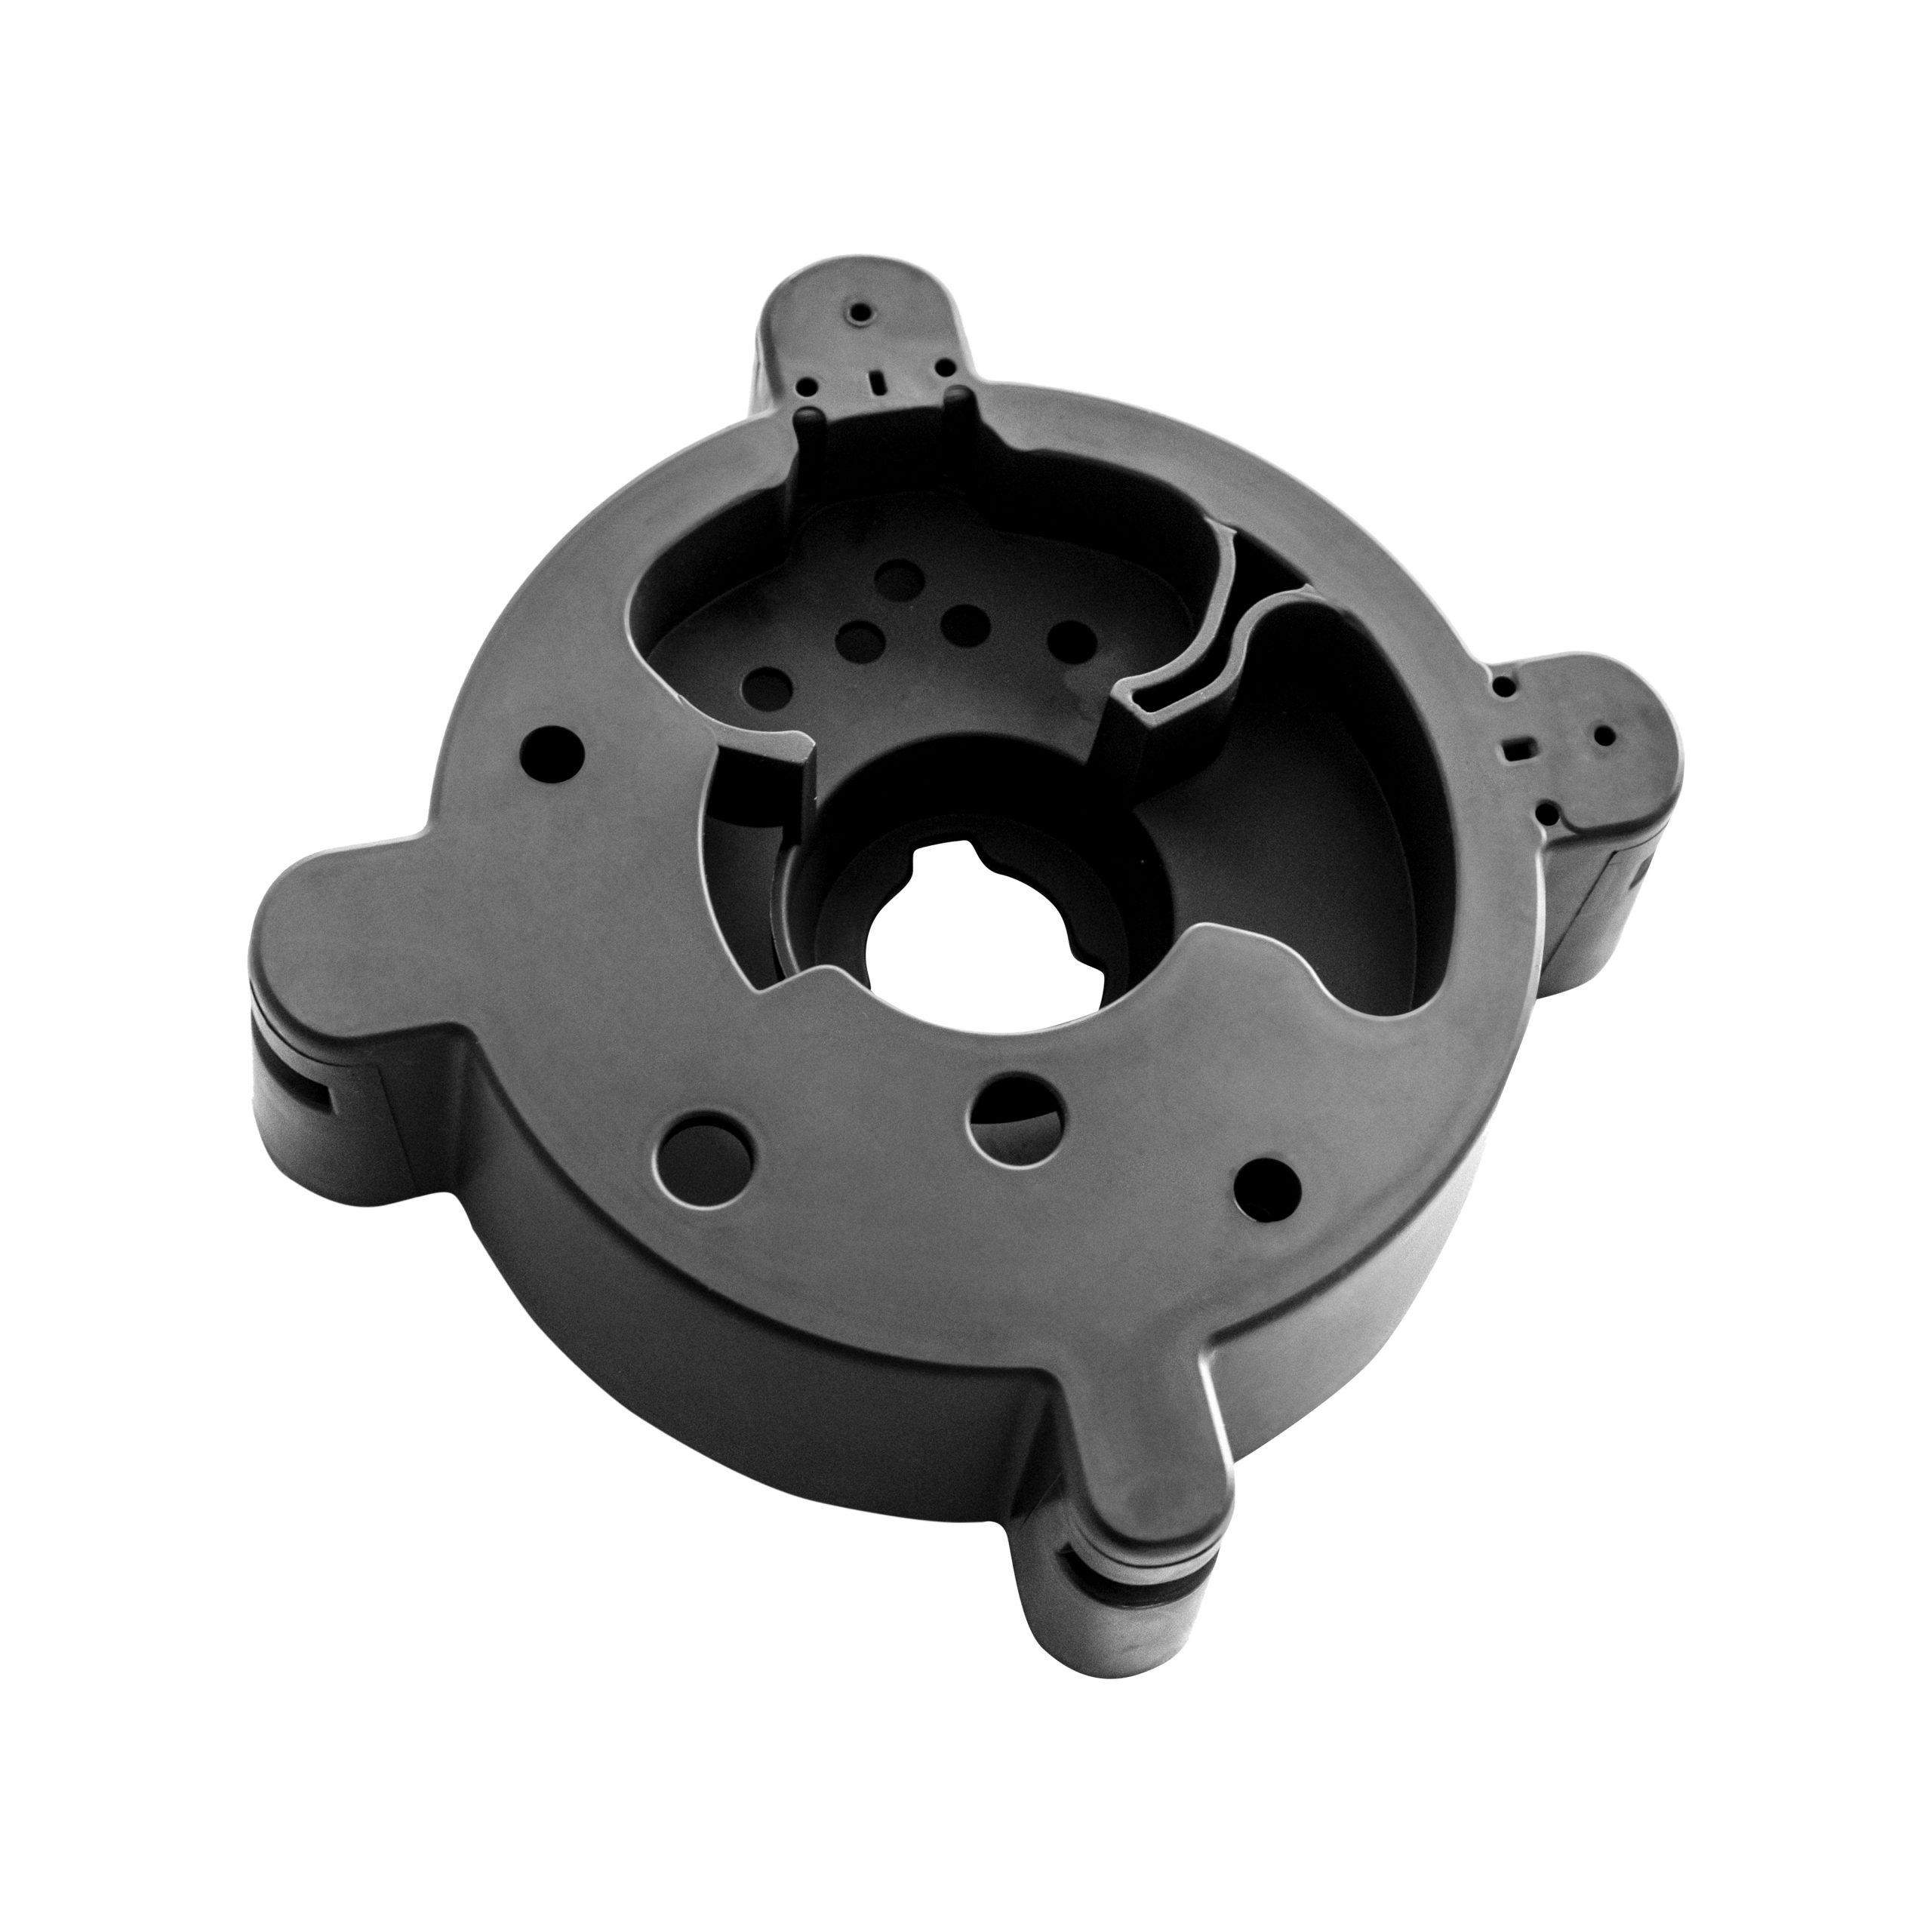 inovamolde-moldes-tecnicos-electrodomesticos-1